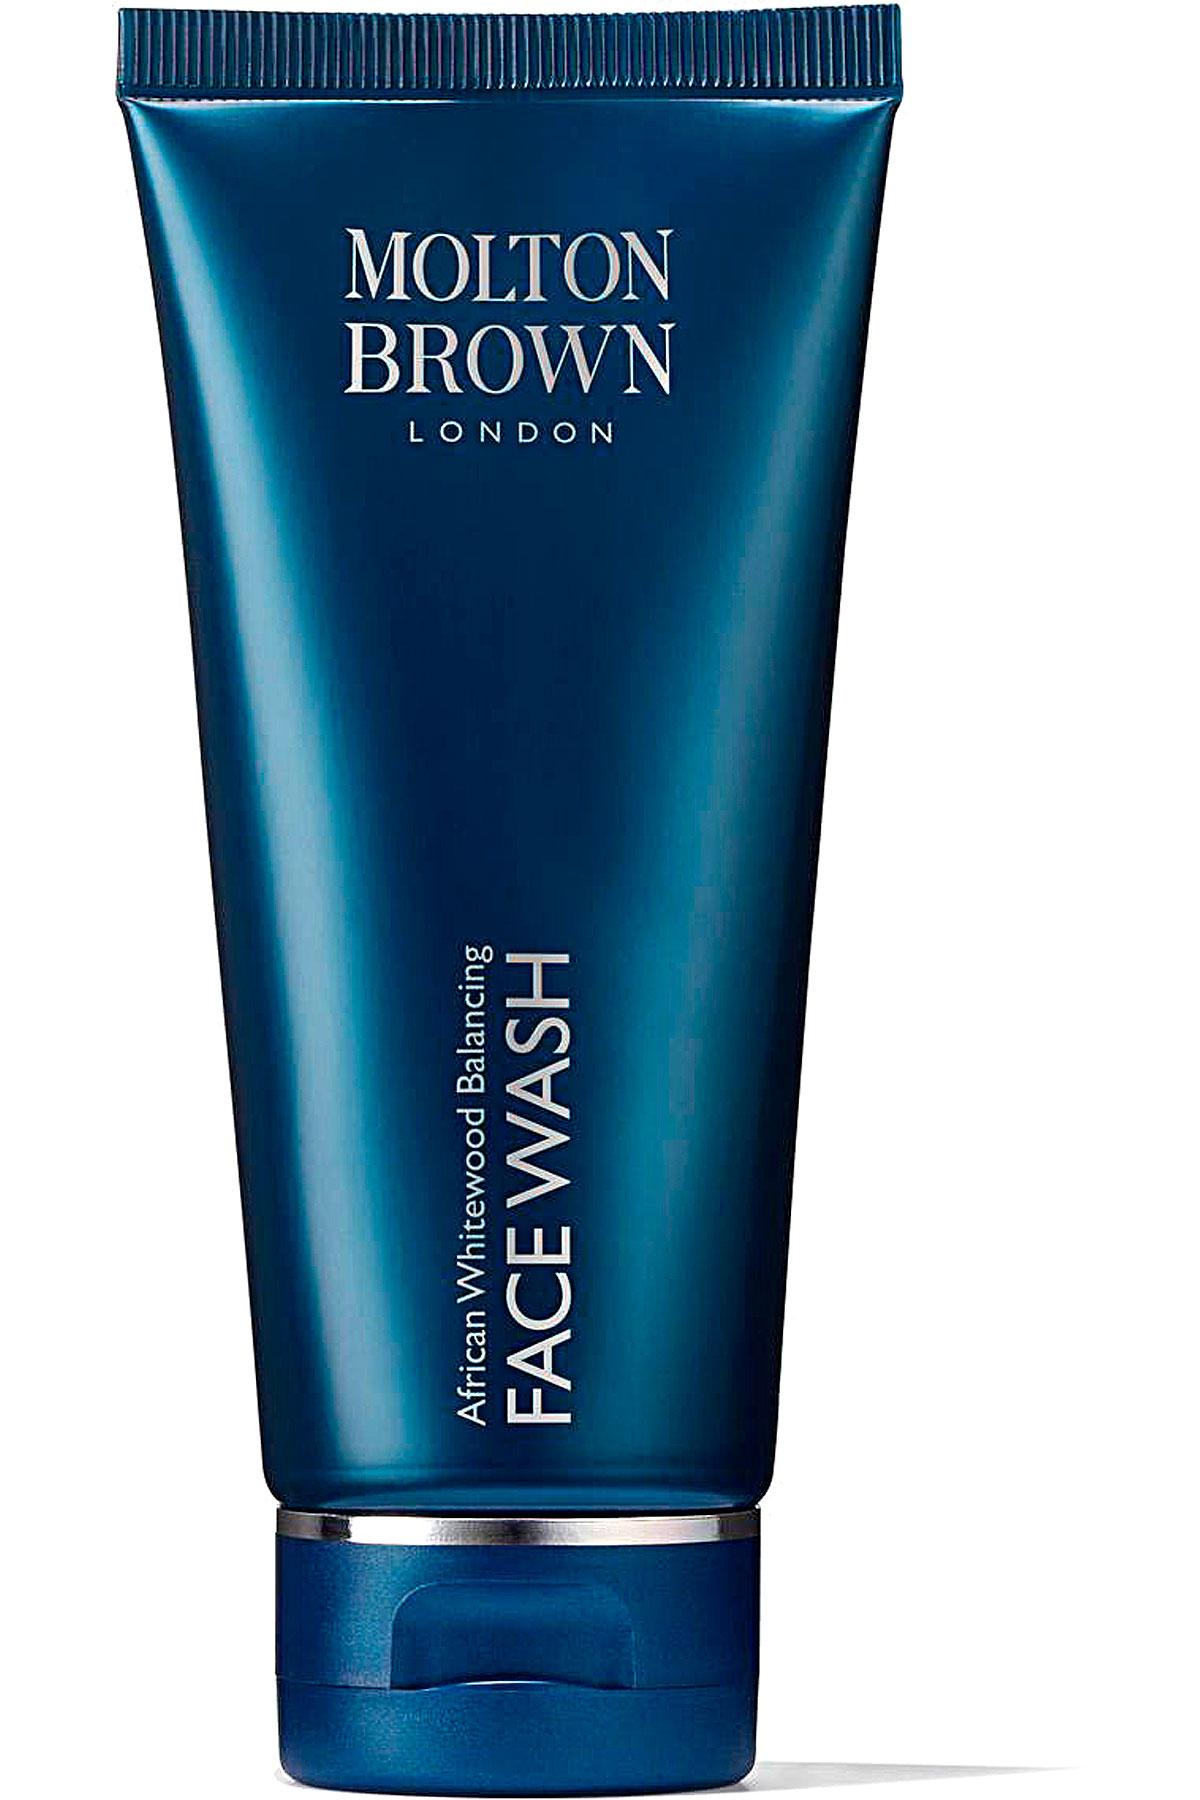 Molton Brown Beauty for Men, Balancing Face Wash - 100 Ml, 2019, 100 ml